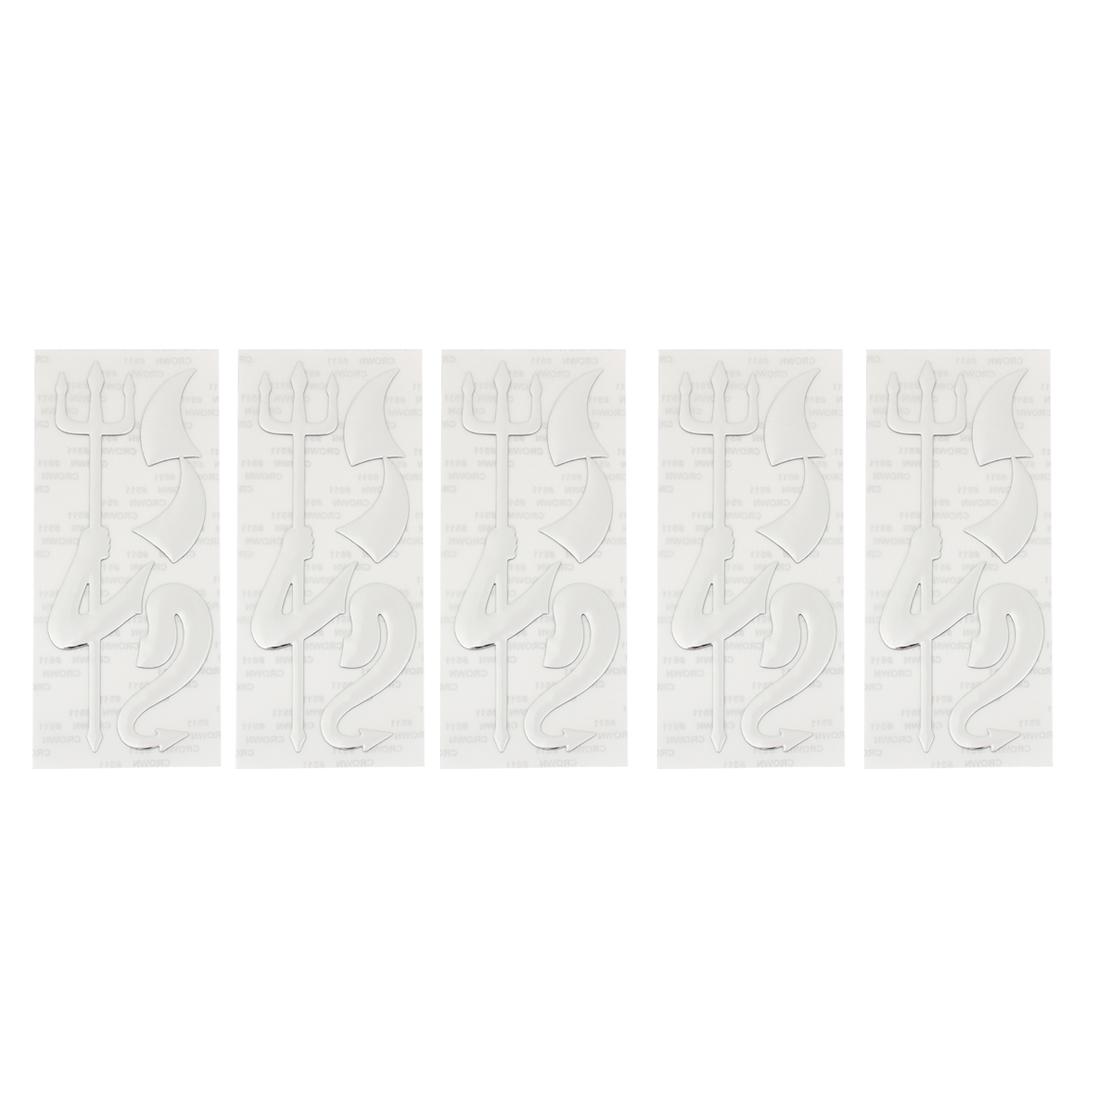 Auto Car Silver Tone PVC 3D Devil Tail Fork Pattern Decorative Stickers 5 Pcs